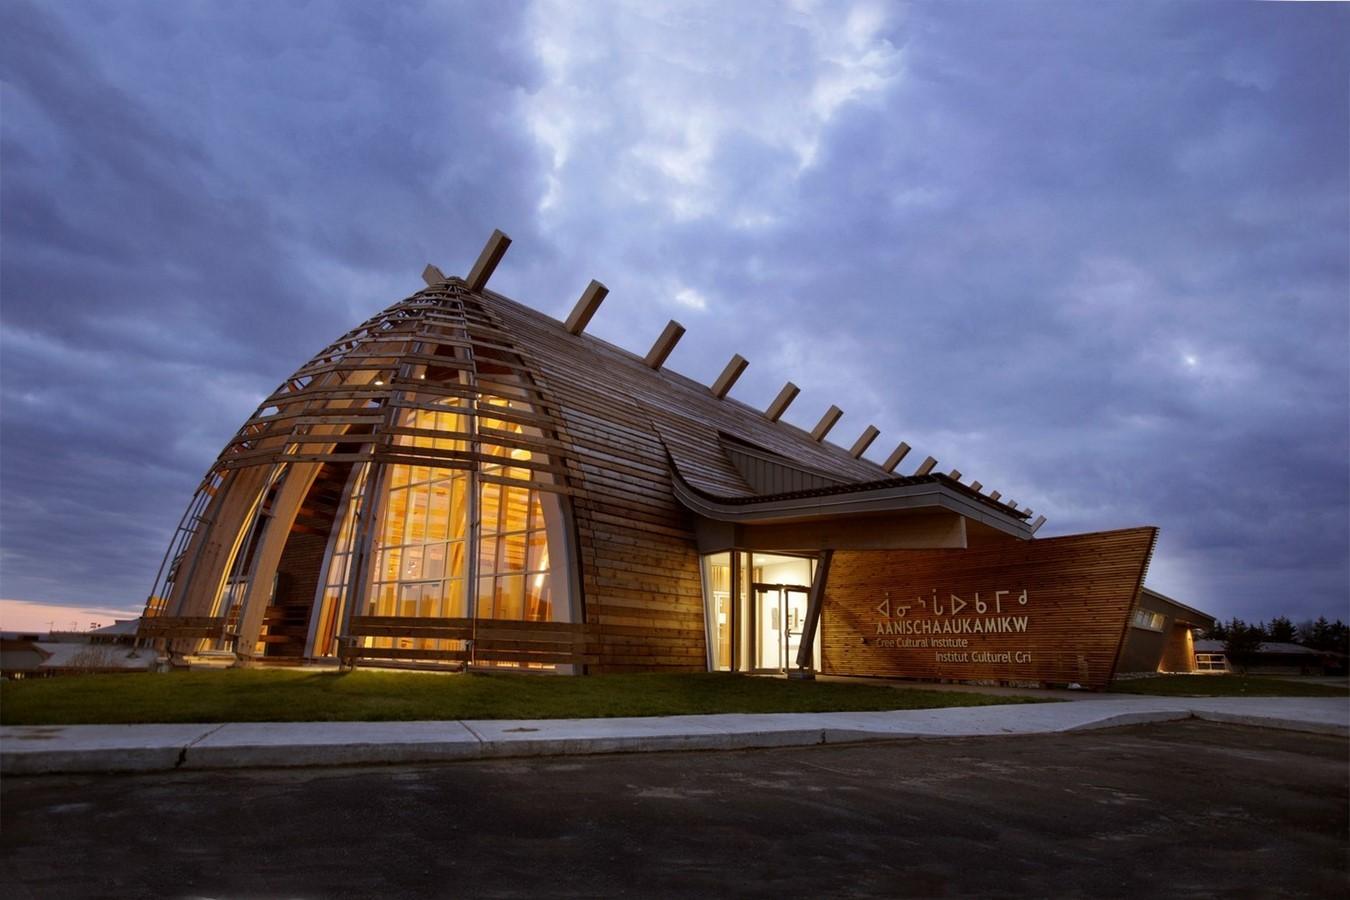 Aanischaaukamikq Cultural Institute